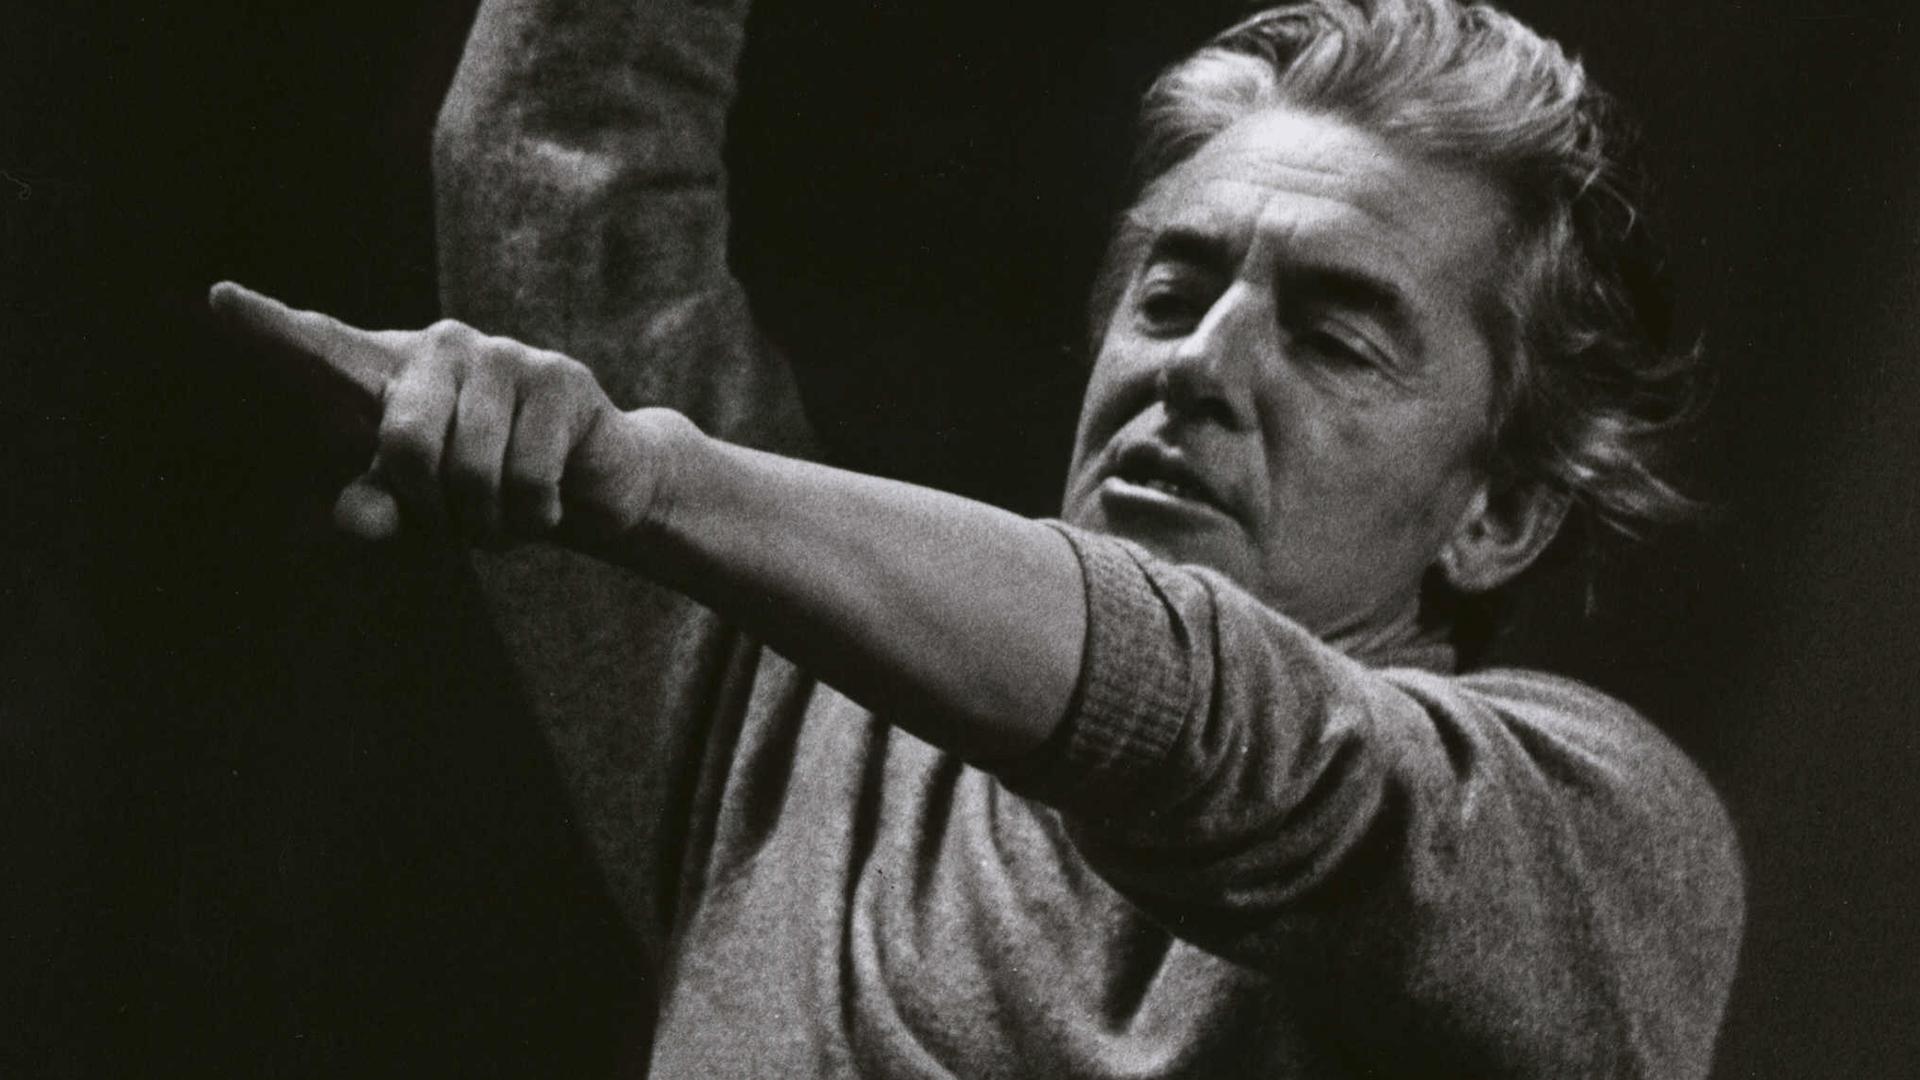 Herbert von Karajan conducts the 1985 New Year's Eve Concert